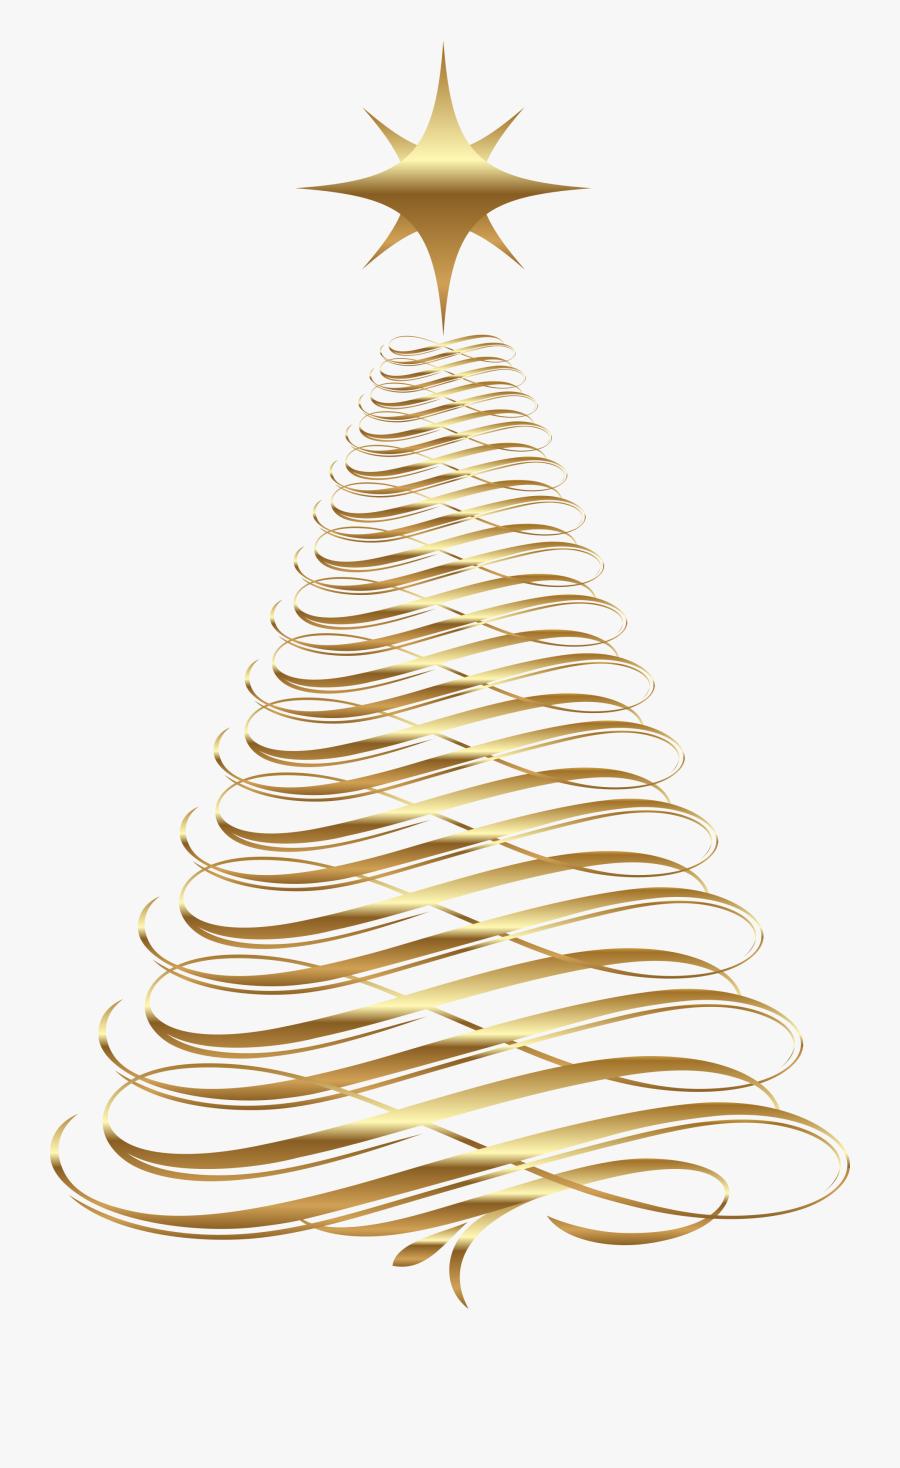 Arbolito De Navidad Png - Gold Christmas Tree Clip Art, Transparent Clipart